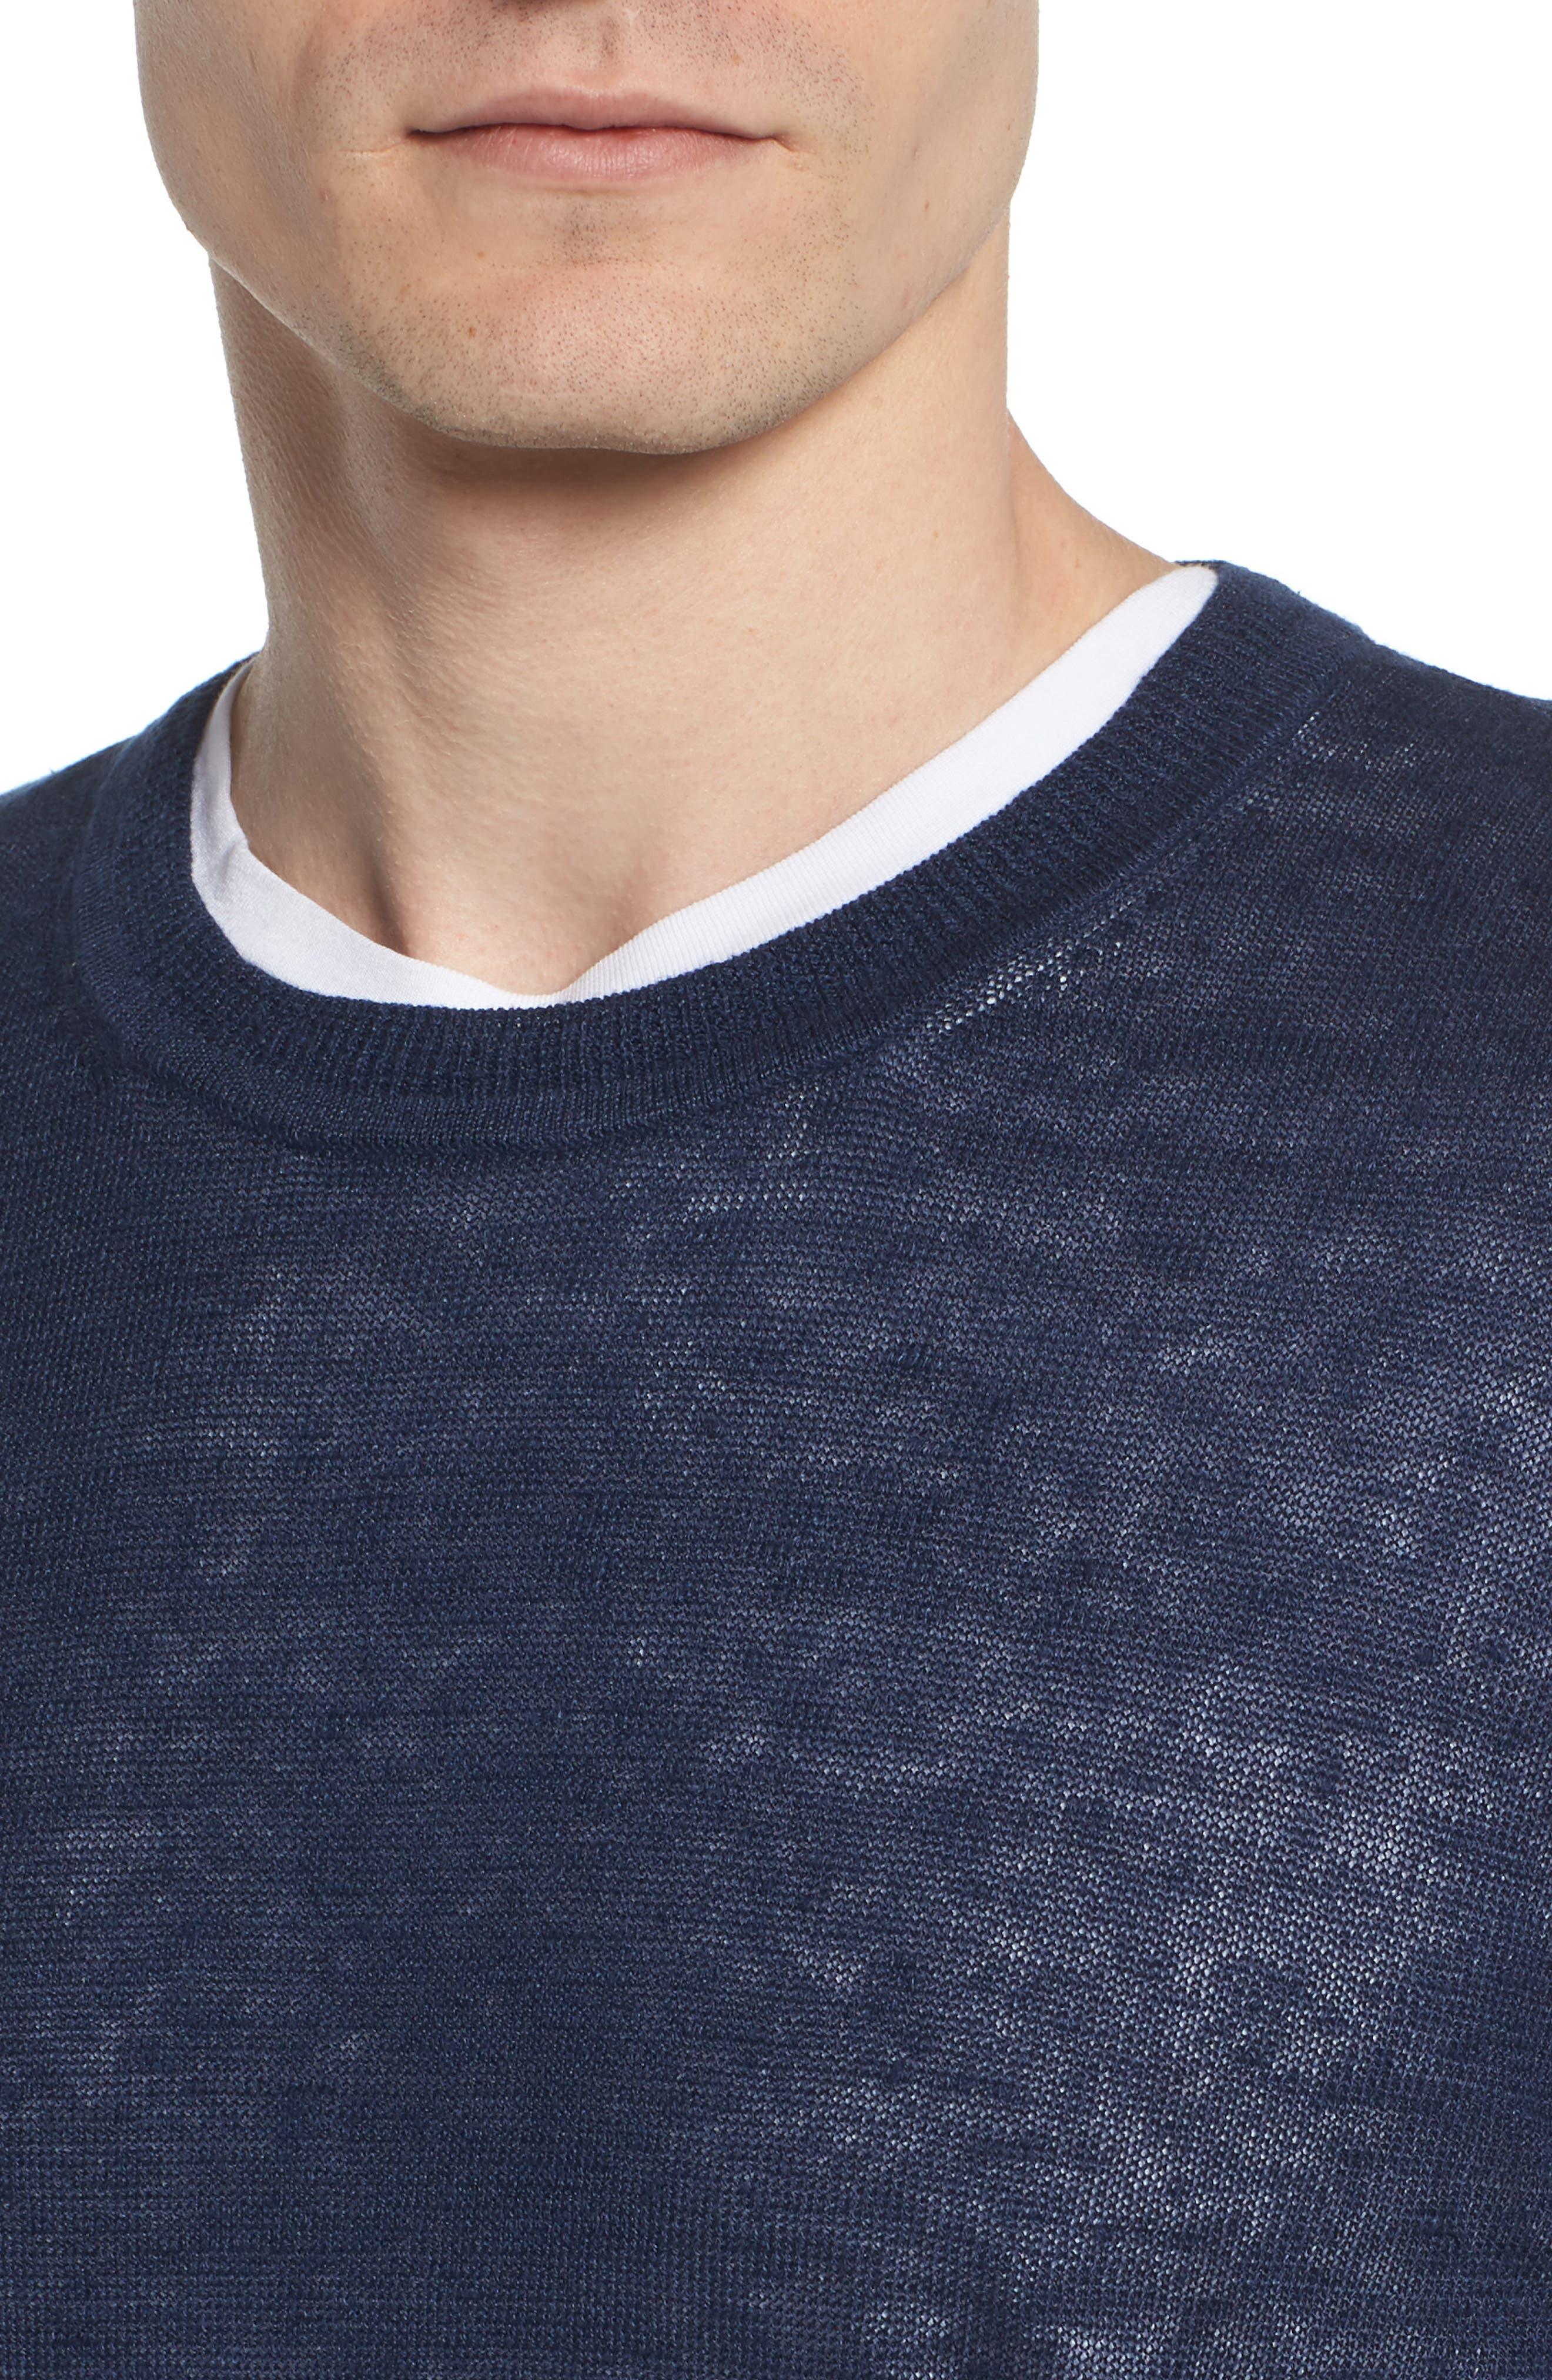 Heyward Long Sleeve T-Shirt,                             Alternate thumbnail 8, color,